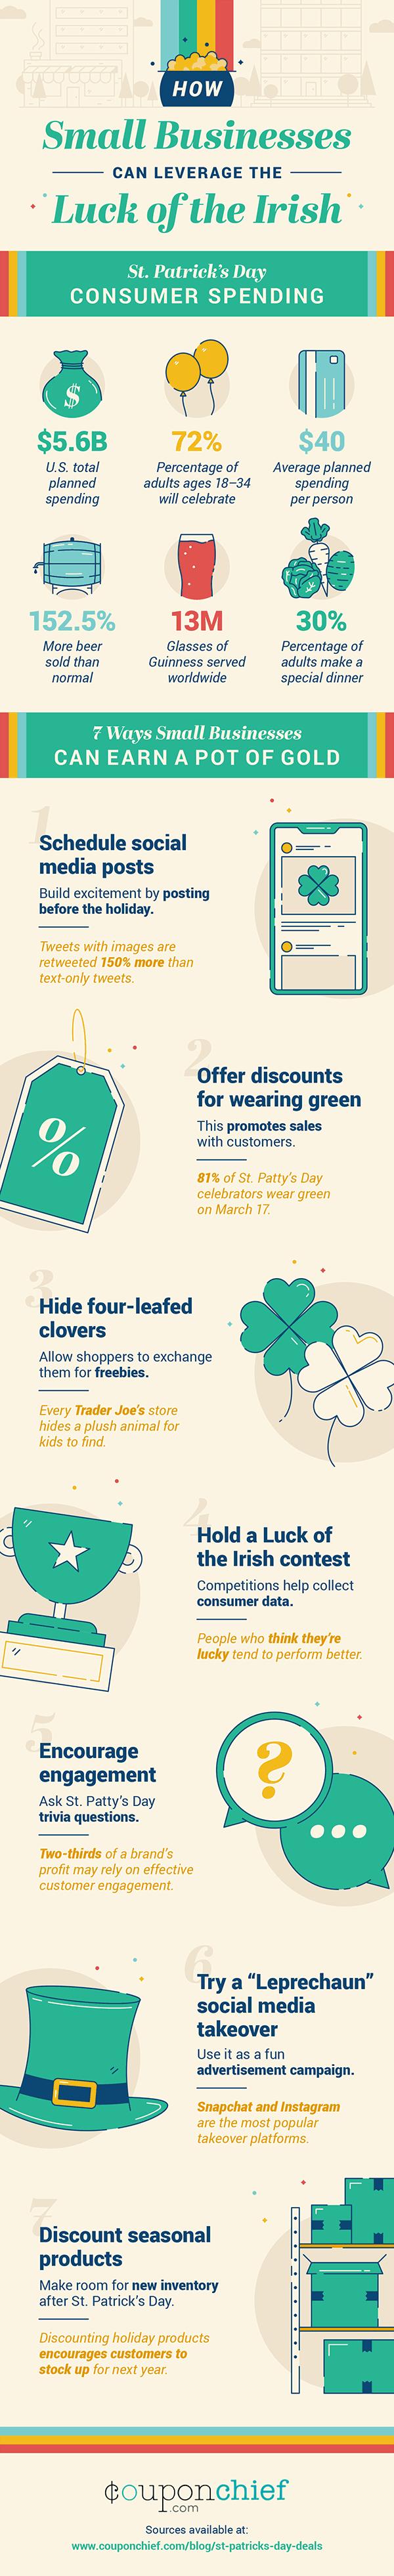 St. Patrick's Day Marketing Strategies